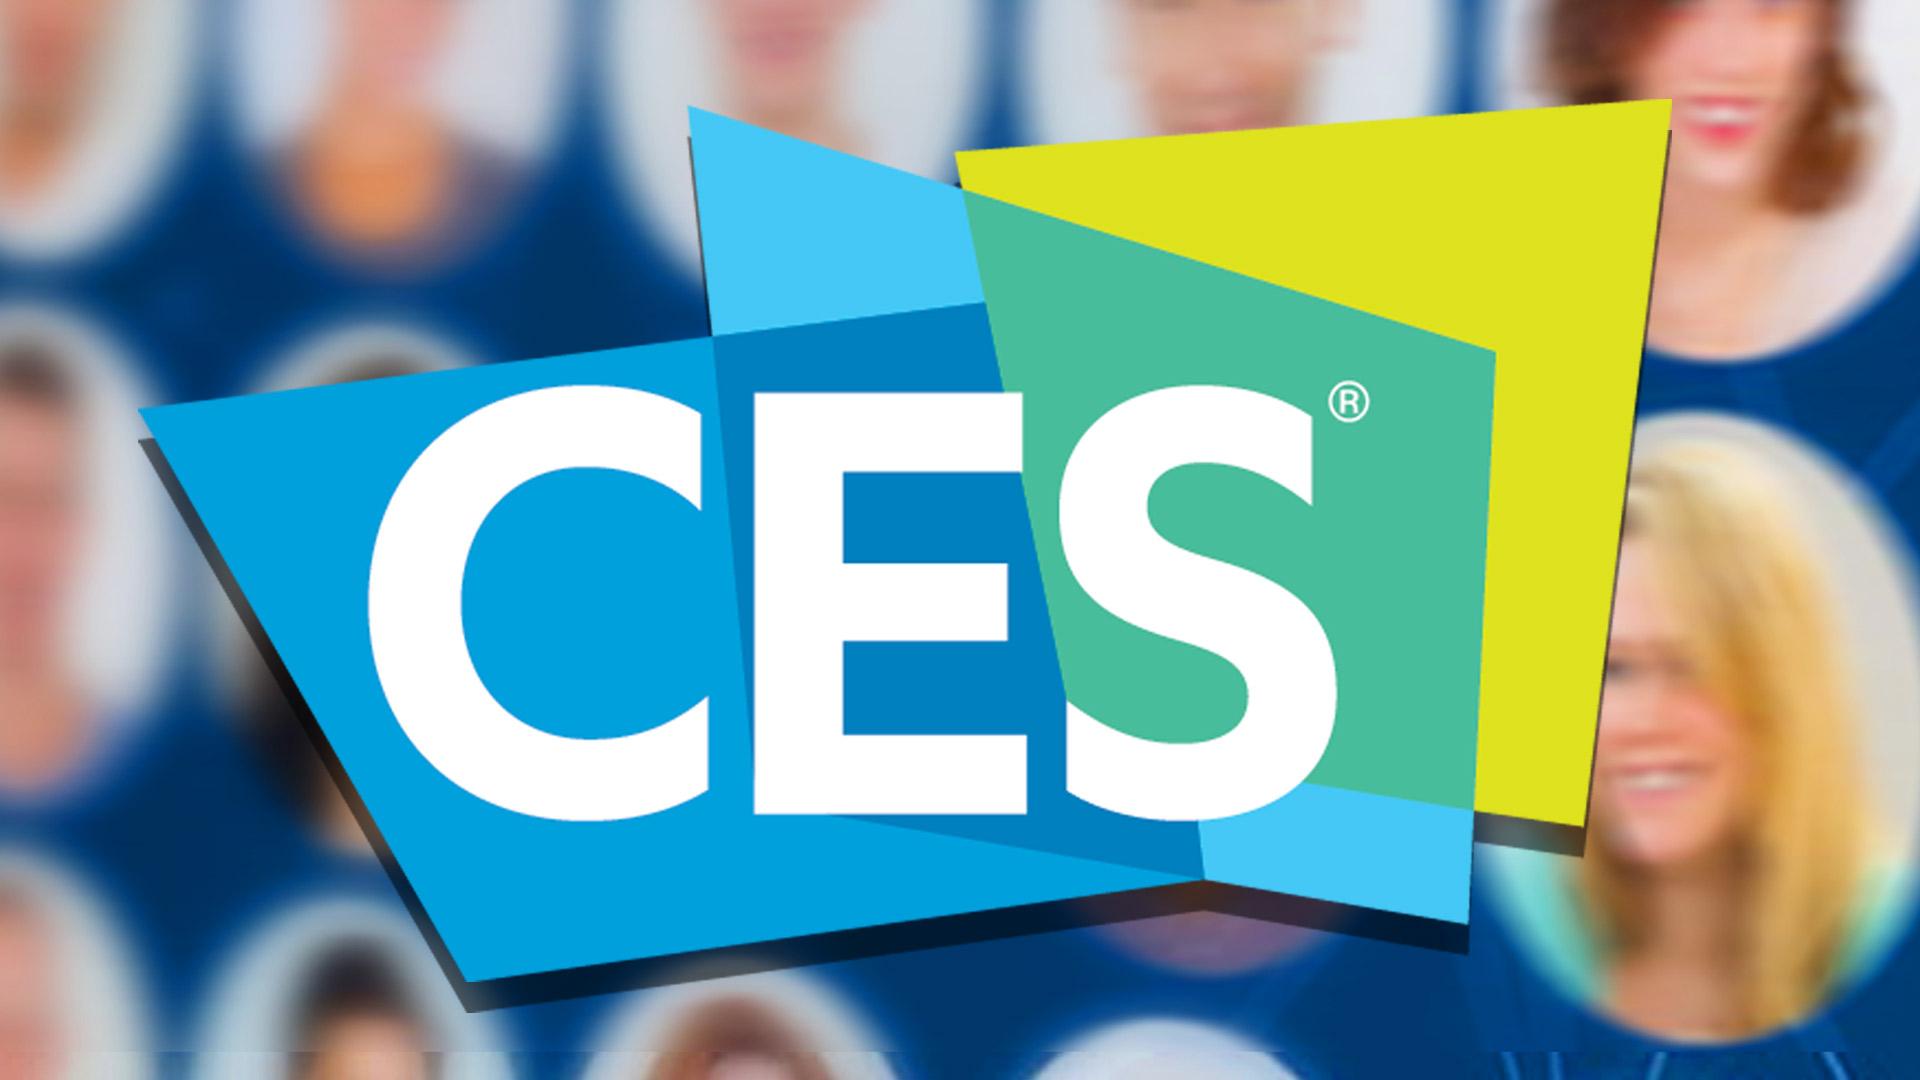 CES 2021 Wrap-Up: 8K Displays, Laptop Revivals, Processor Wars, Smart Masks, and Touchless Toilets